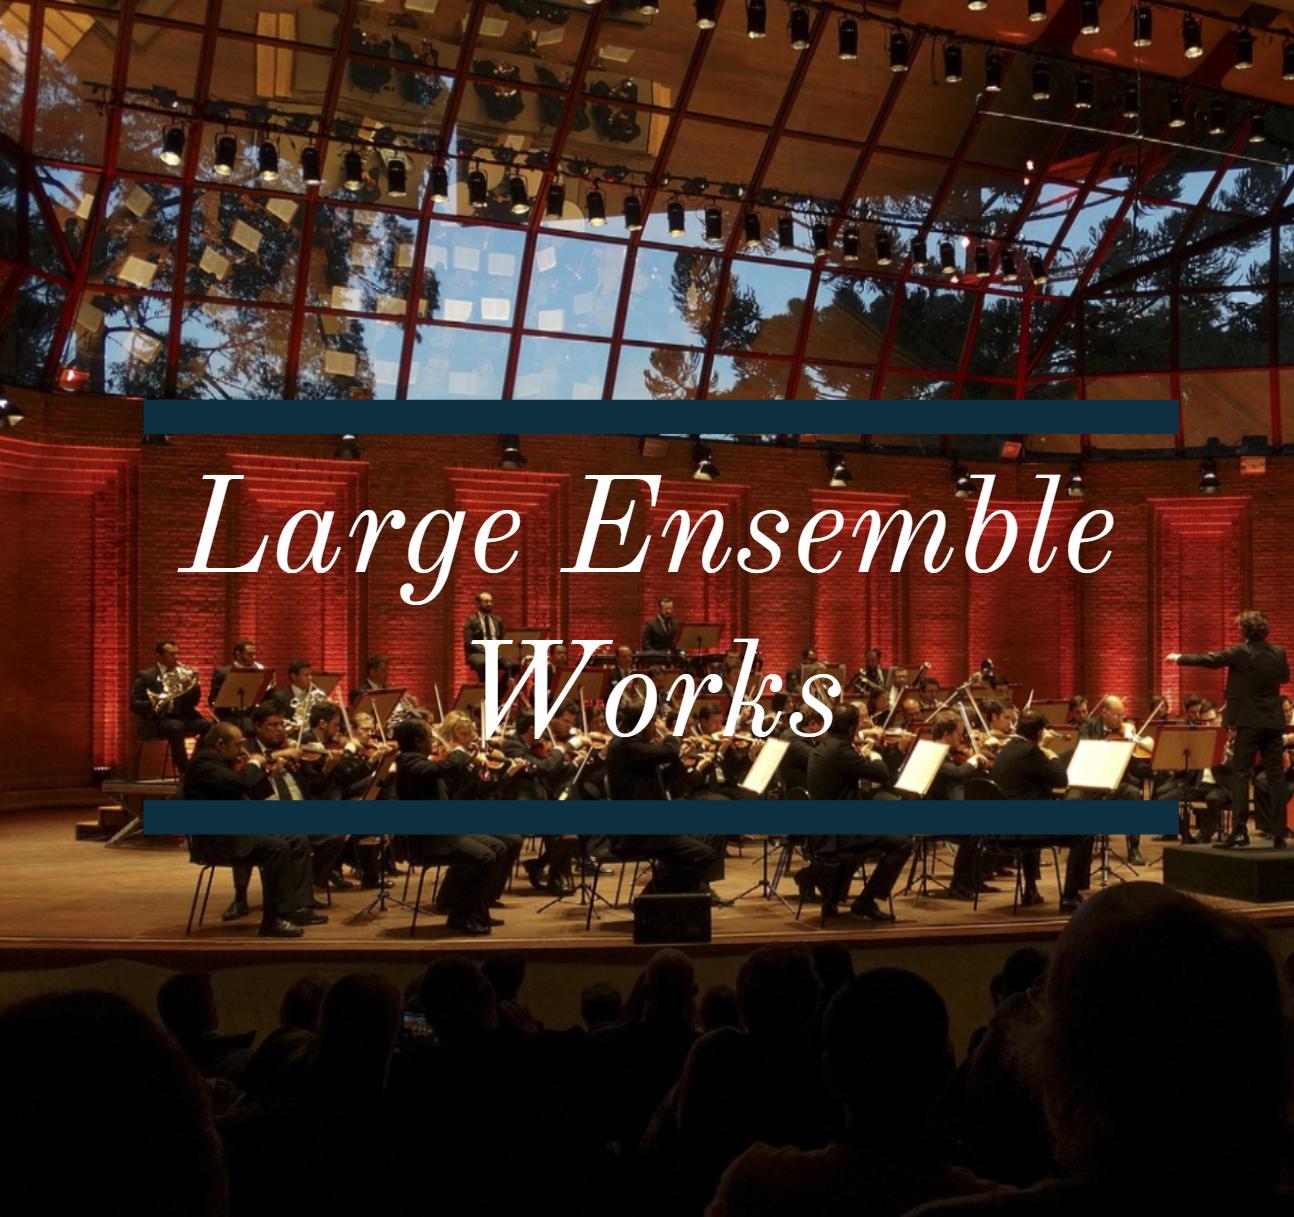 Large Ensemble Works